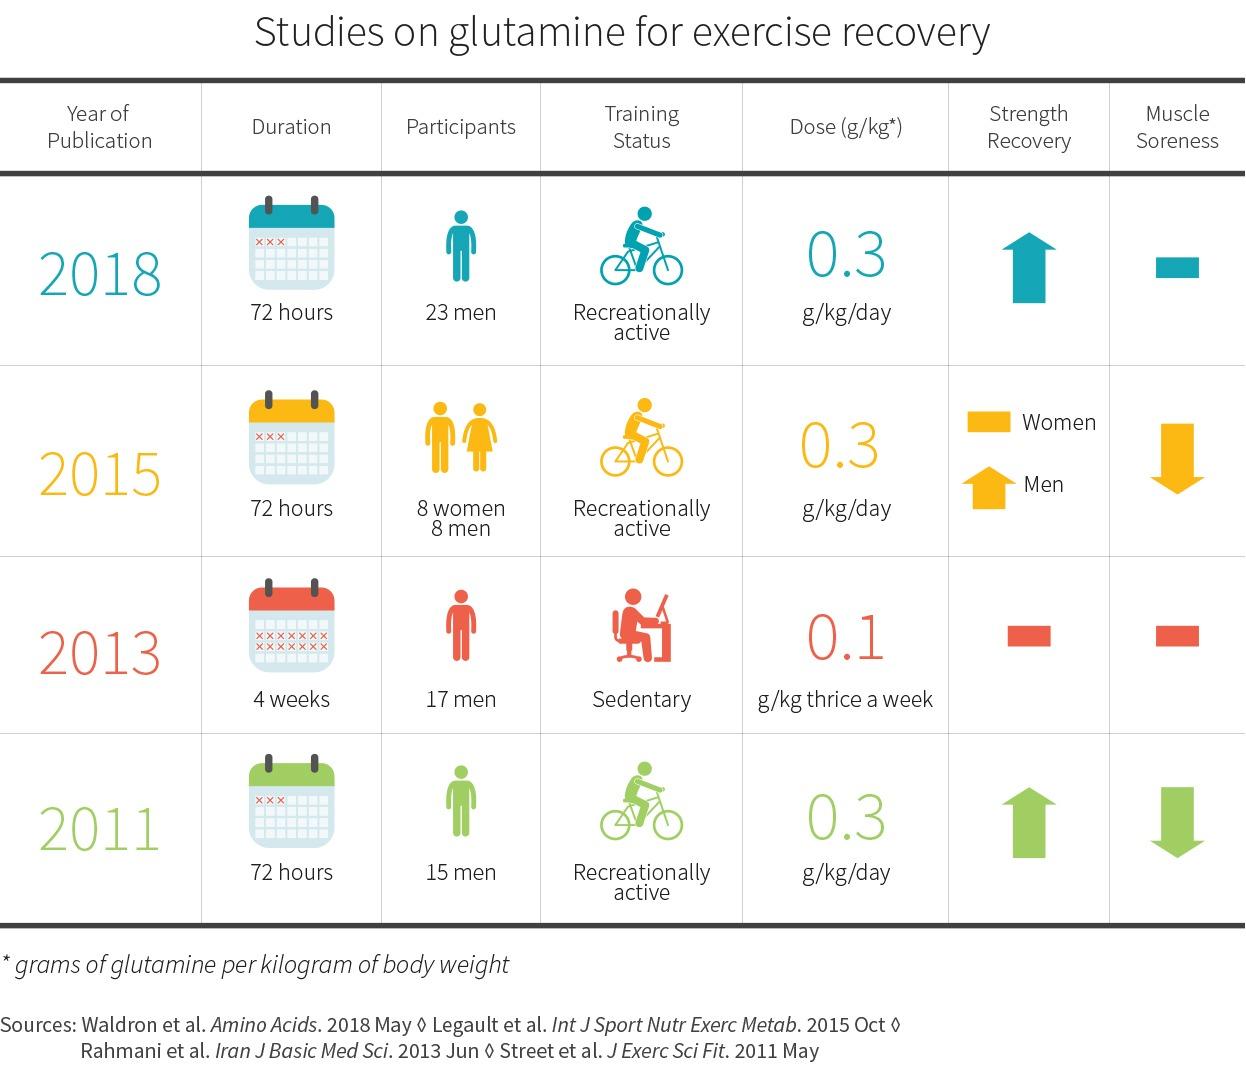 uticaj i uloga glutamina